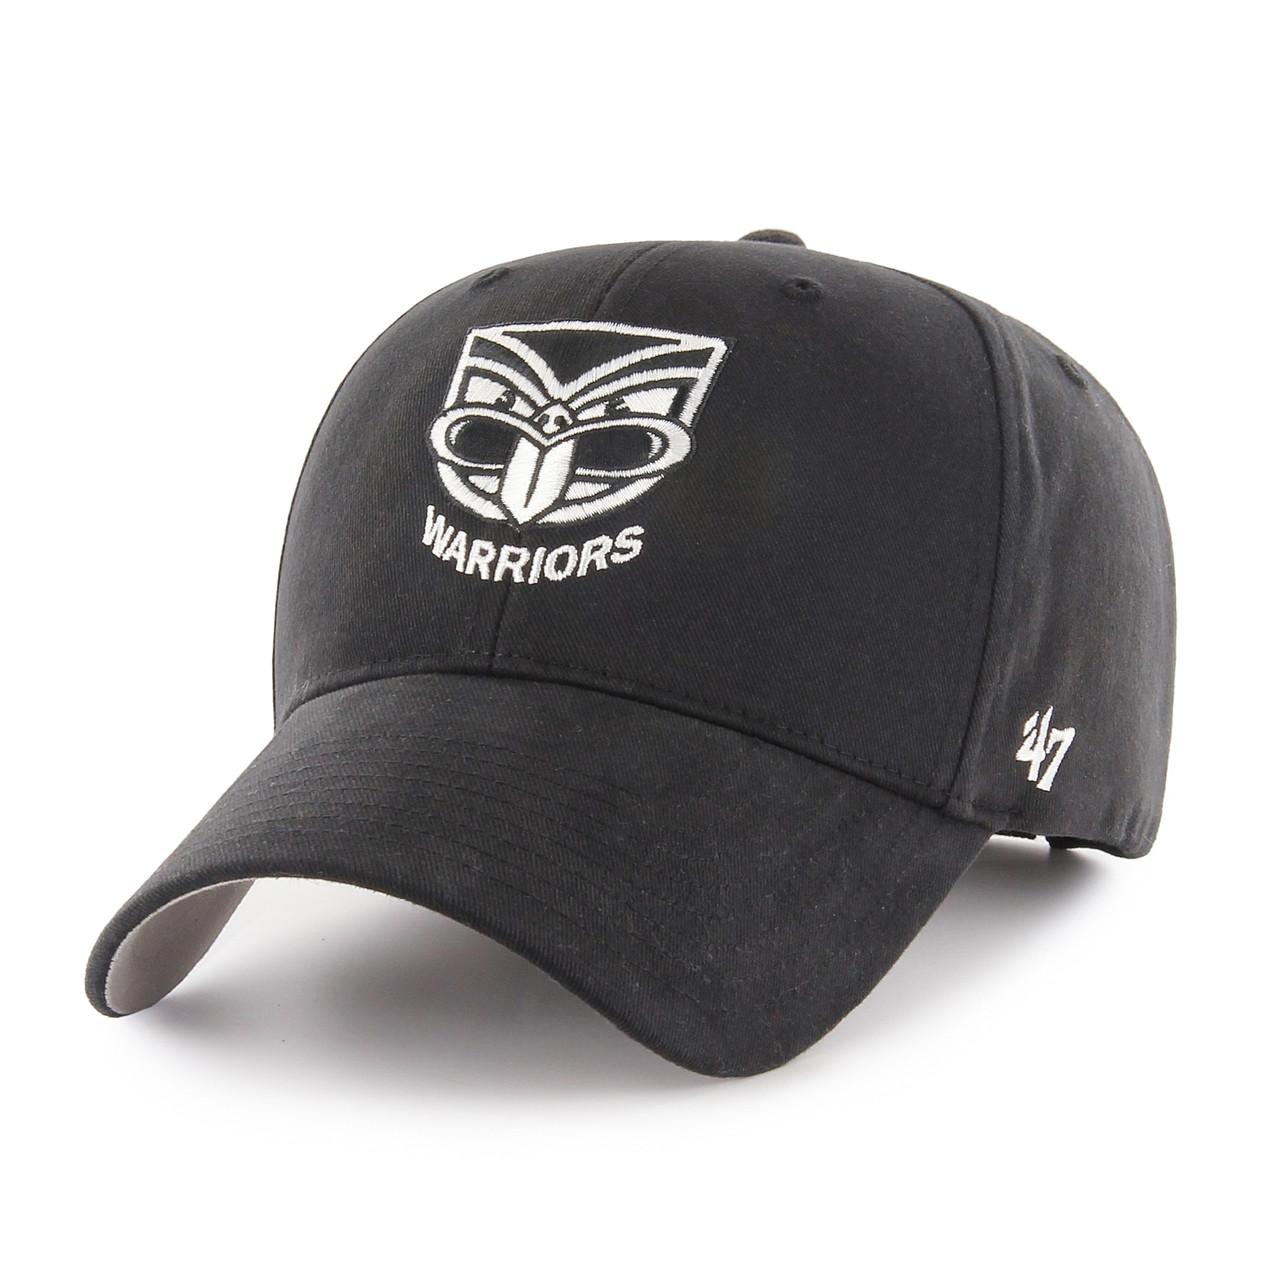 sale retailer dc805 ad11e 2017 Warriors Basic  47 MVP Cap - Kids